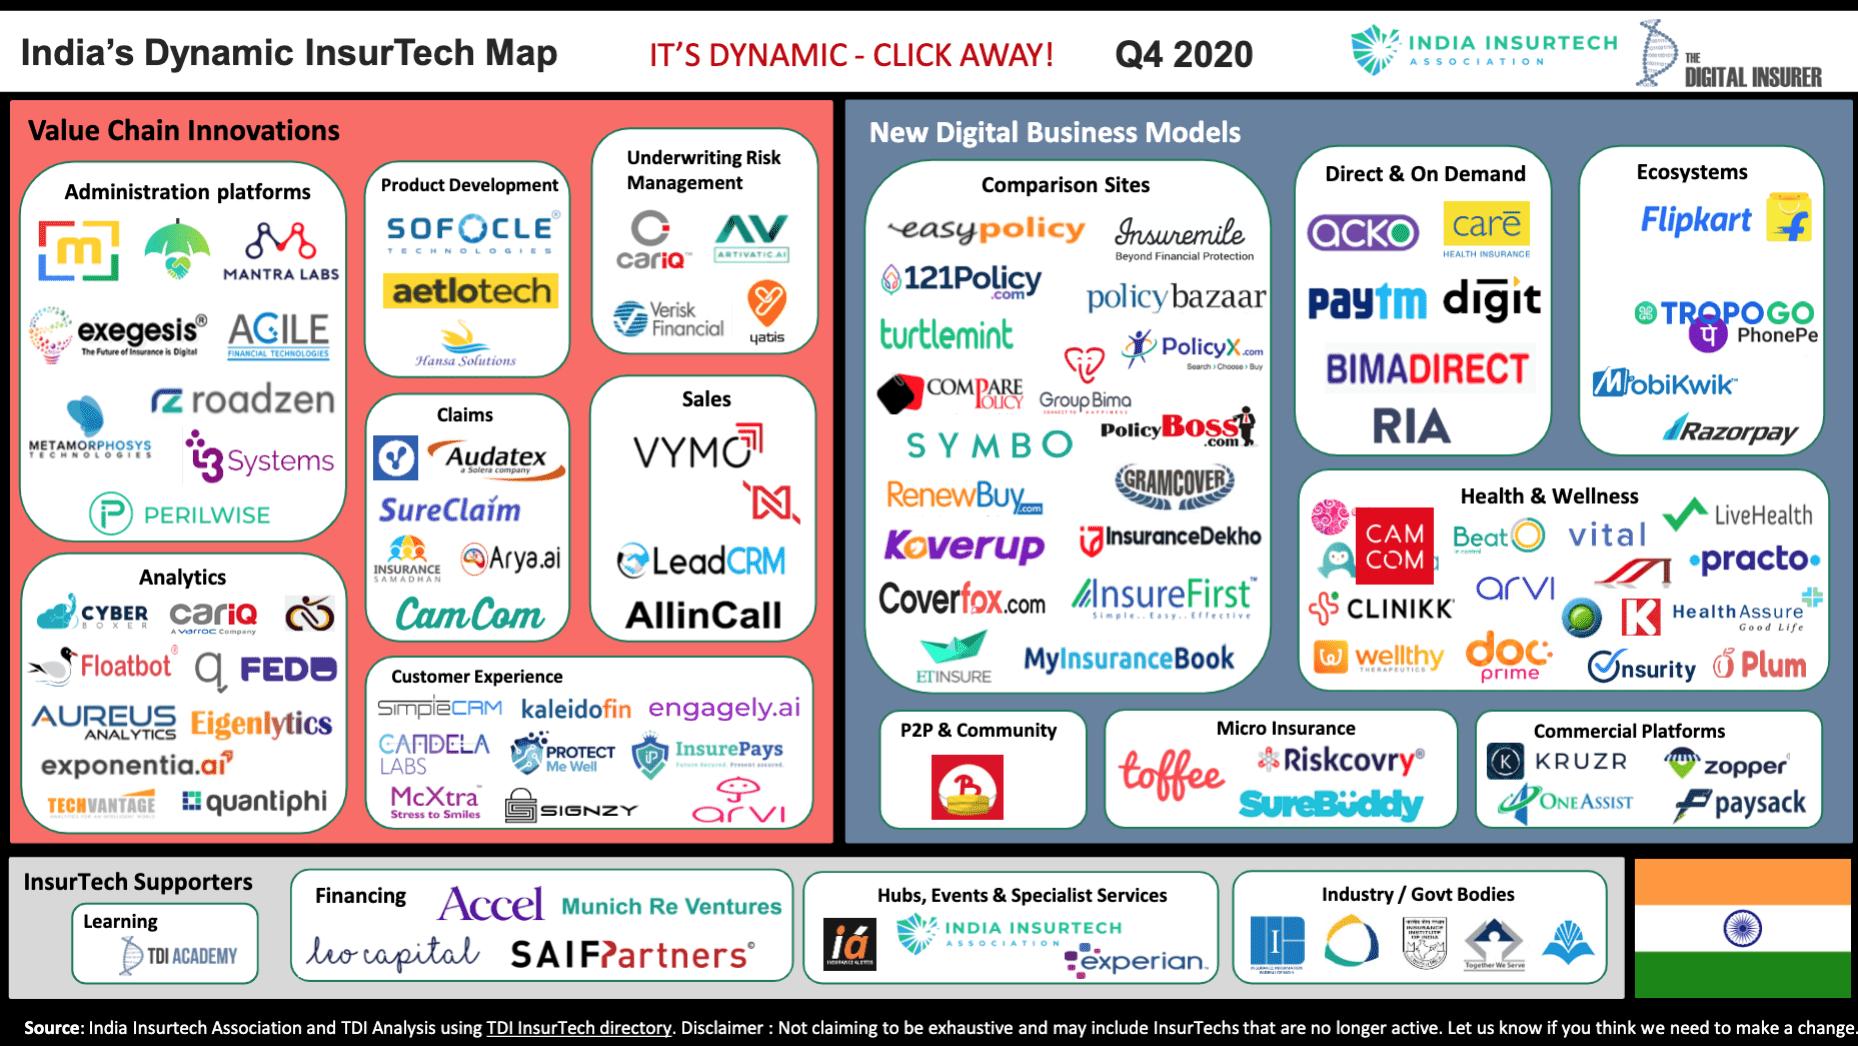 India's Dynamic Insurtech Map, Source- India Insurtech Association, the Digital Insurer, Q4 2020